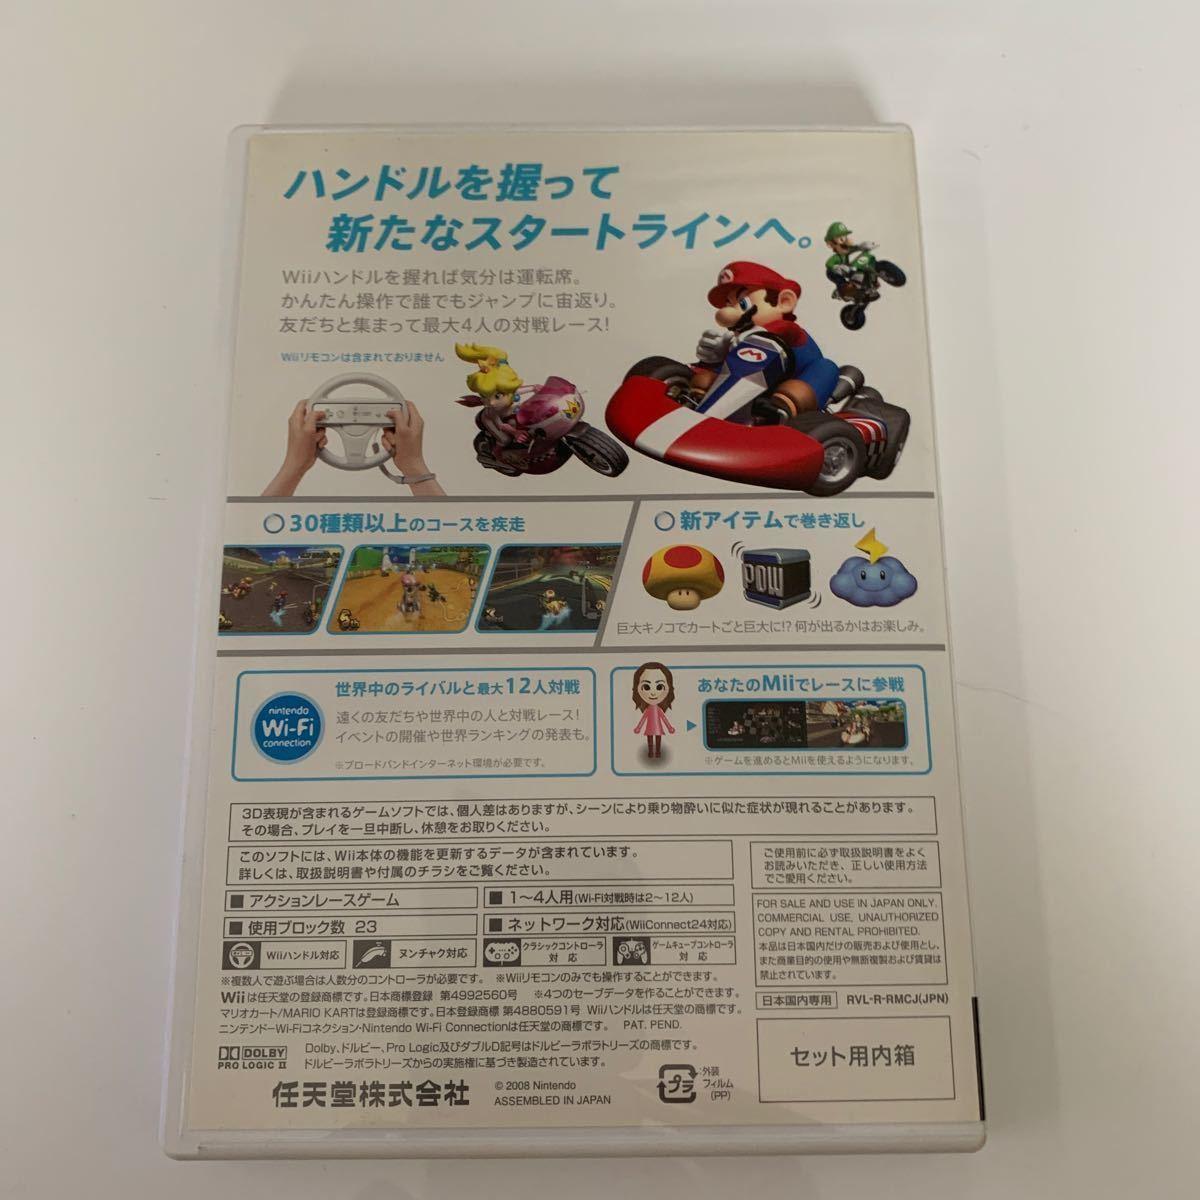 Wiiマリオカート